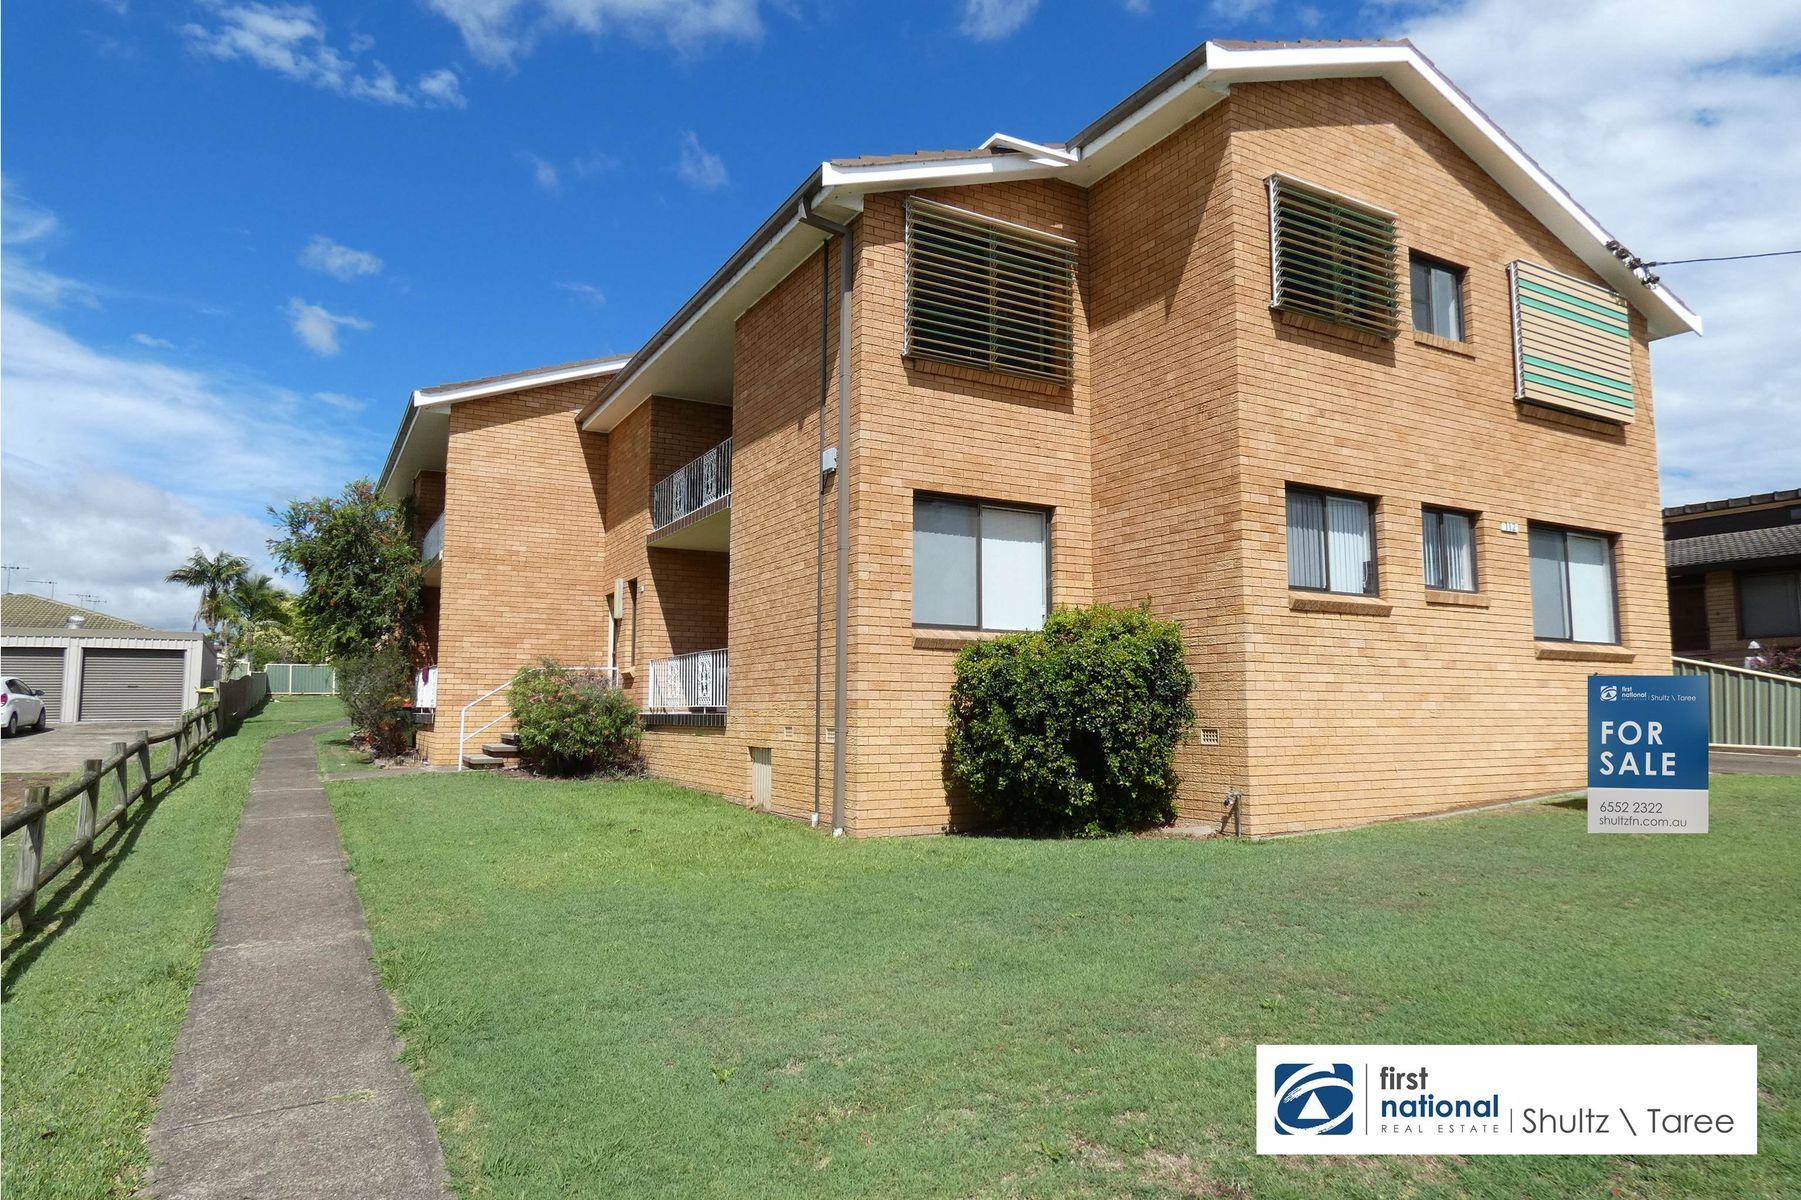 1 112 Albert St Taree Nsw 2430 Australia Unit For Sale